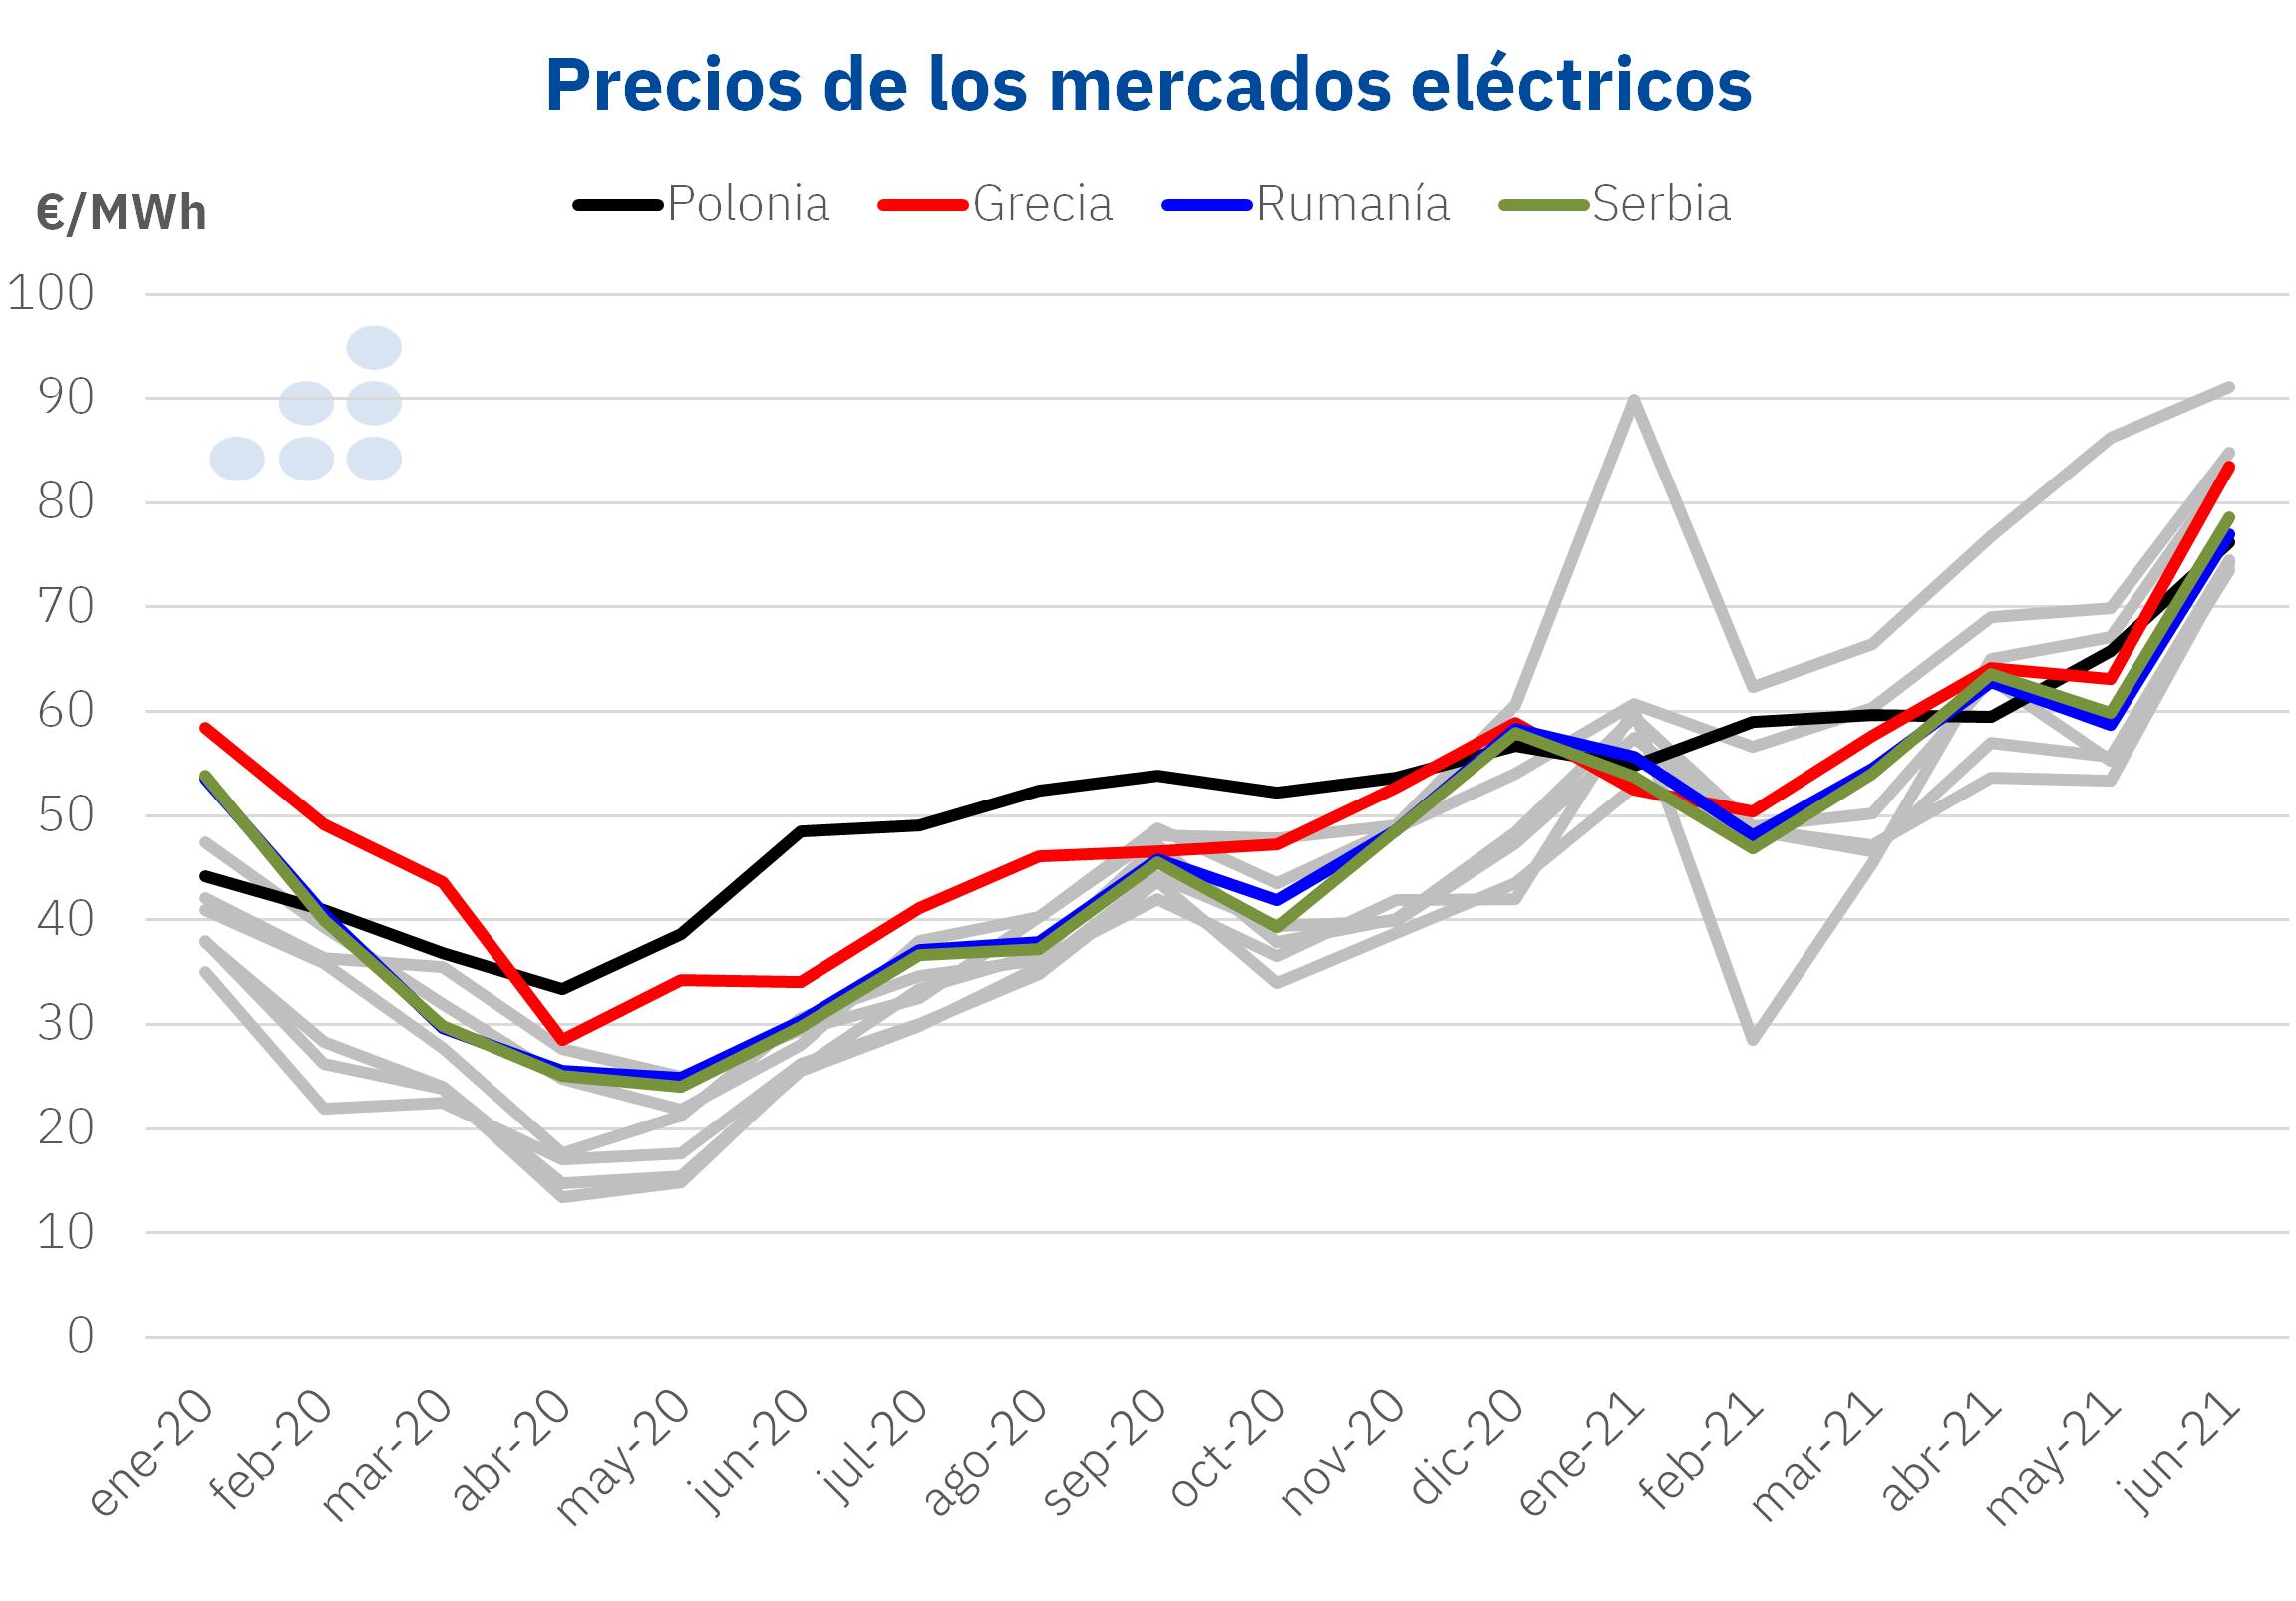 AleaSoft - precios mercados electricos polonia grecia rumania serbia